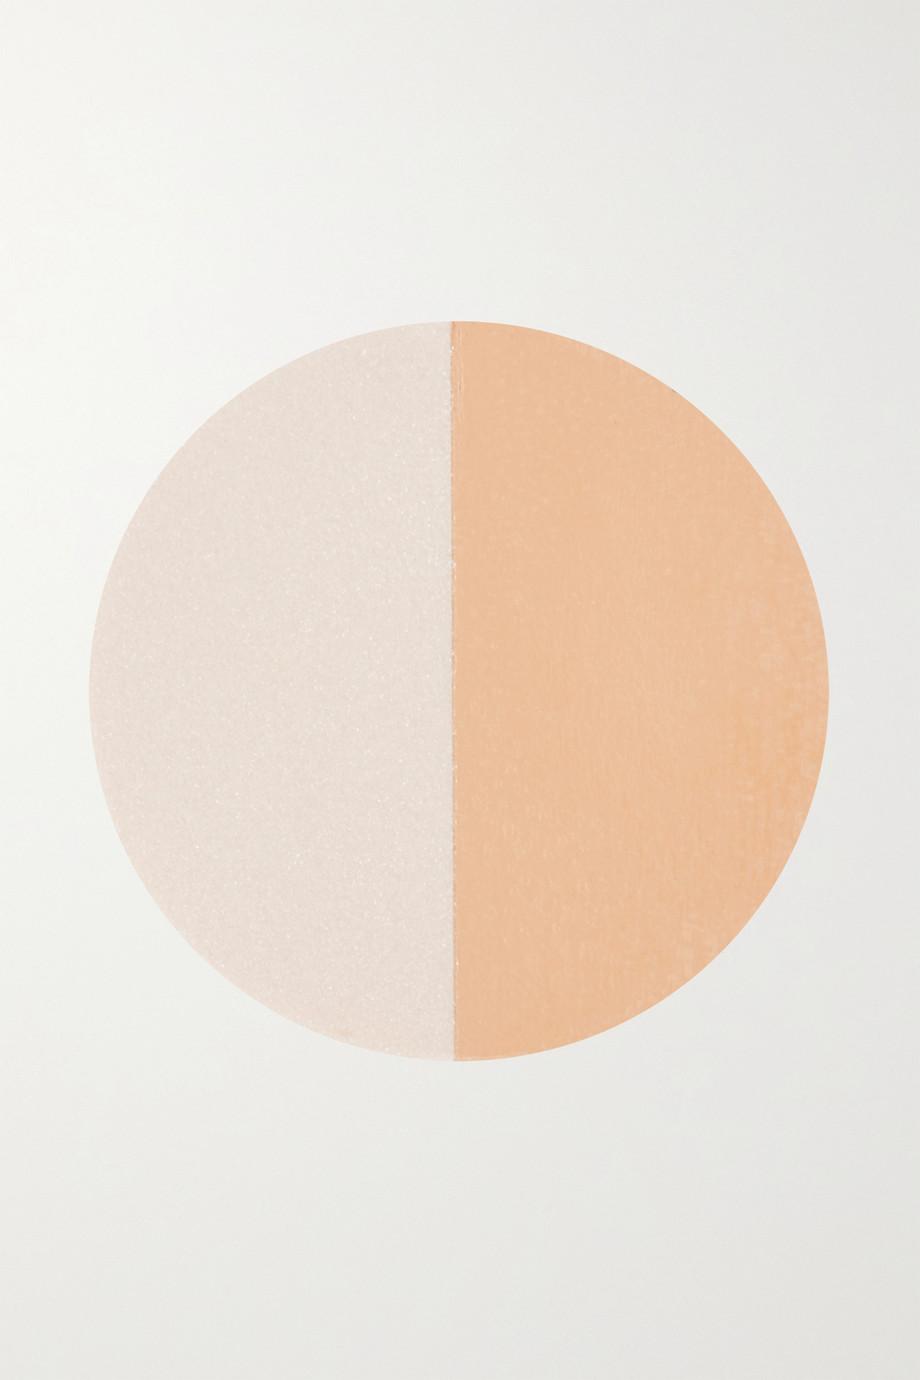 BY TERRY Fond de teint stick deux-en-un Nude Expert, Rosy Beige 4